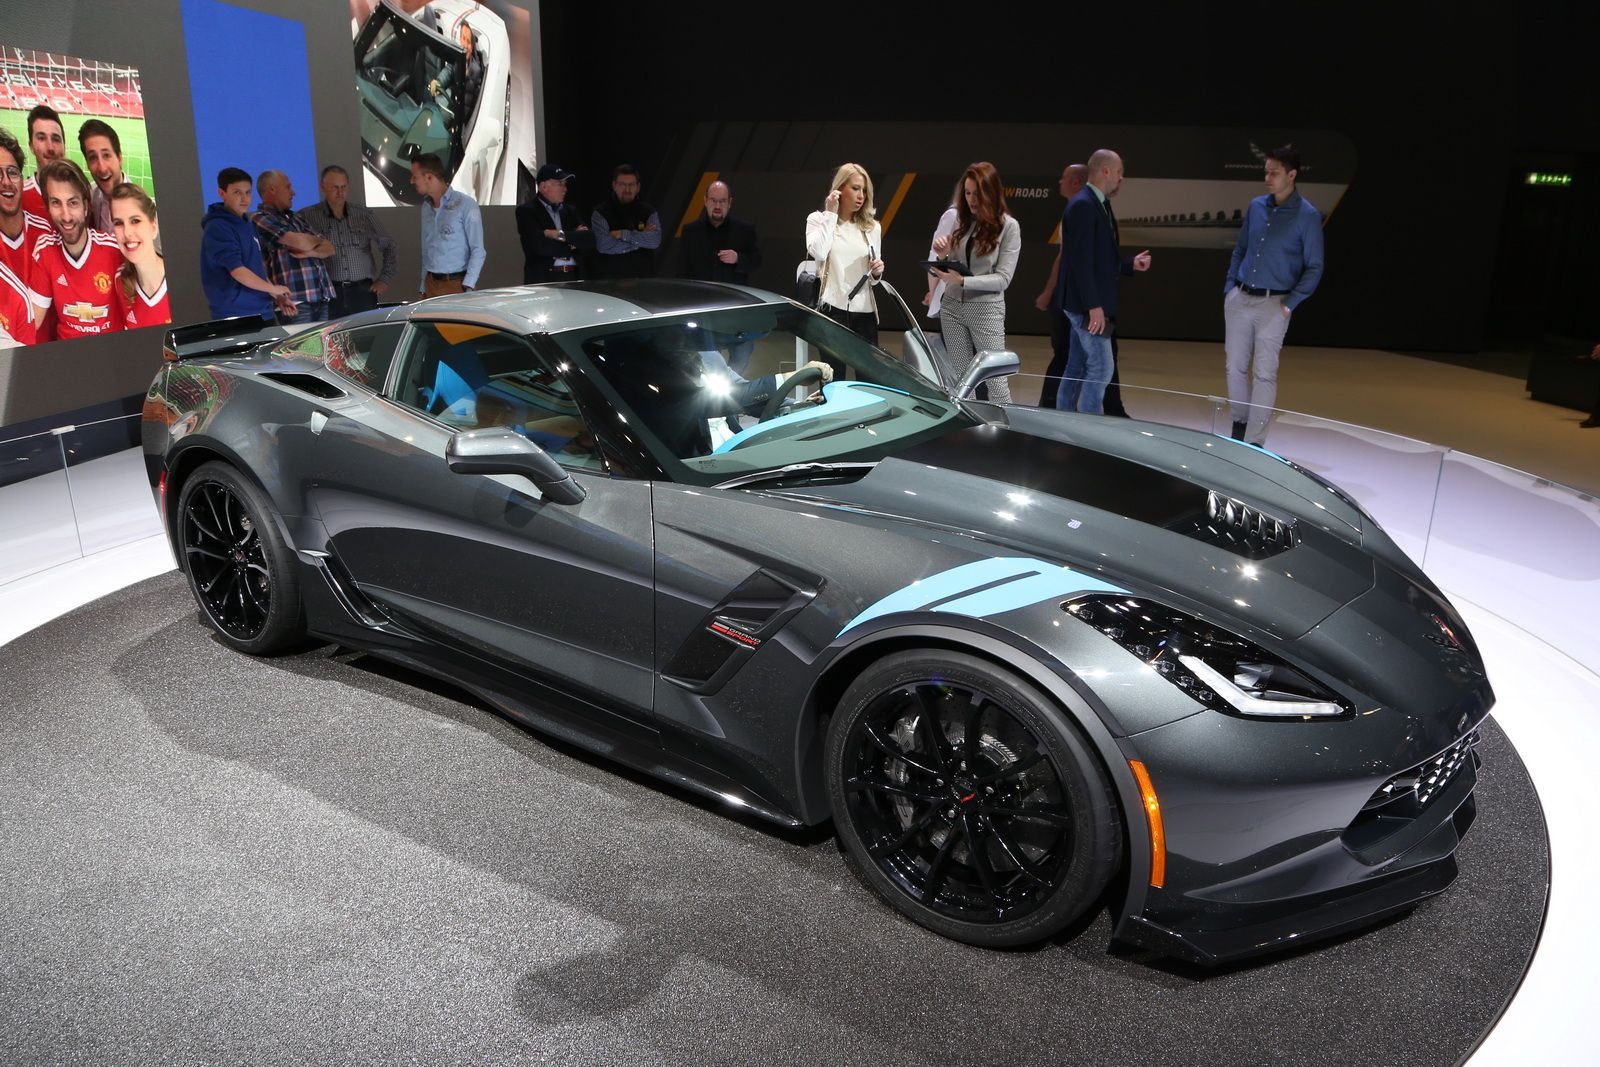 2017 corvette zora zr1 specs price autos concept - 2017 Corvette Zora Zr1 Specs Price Autos Concept 29